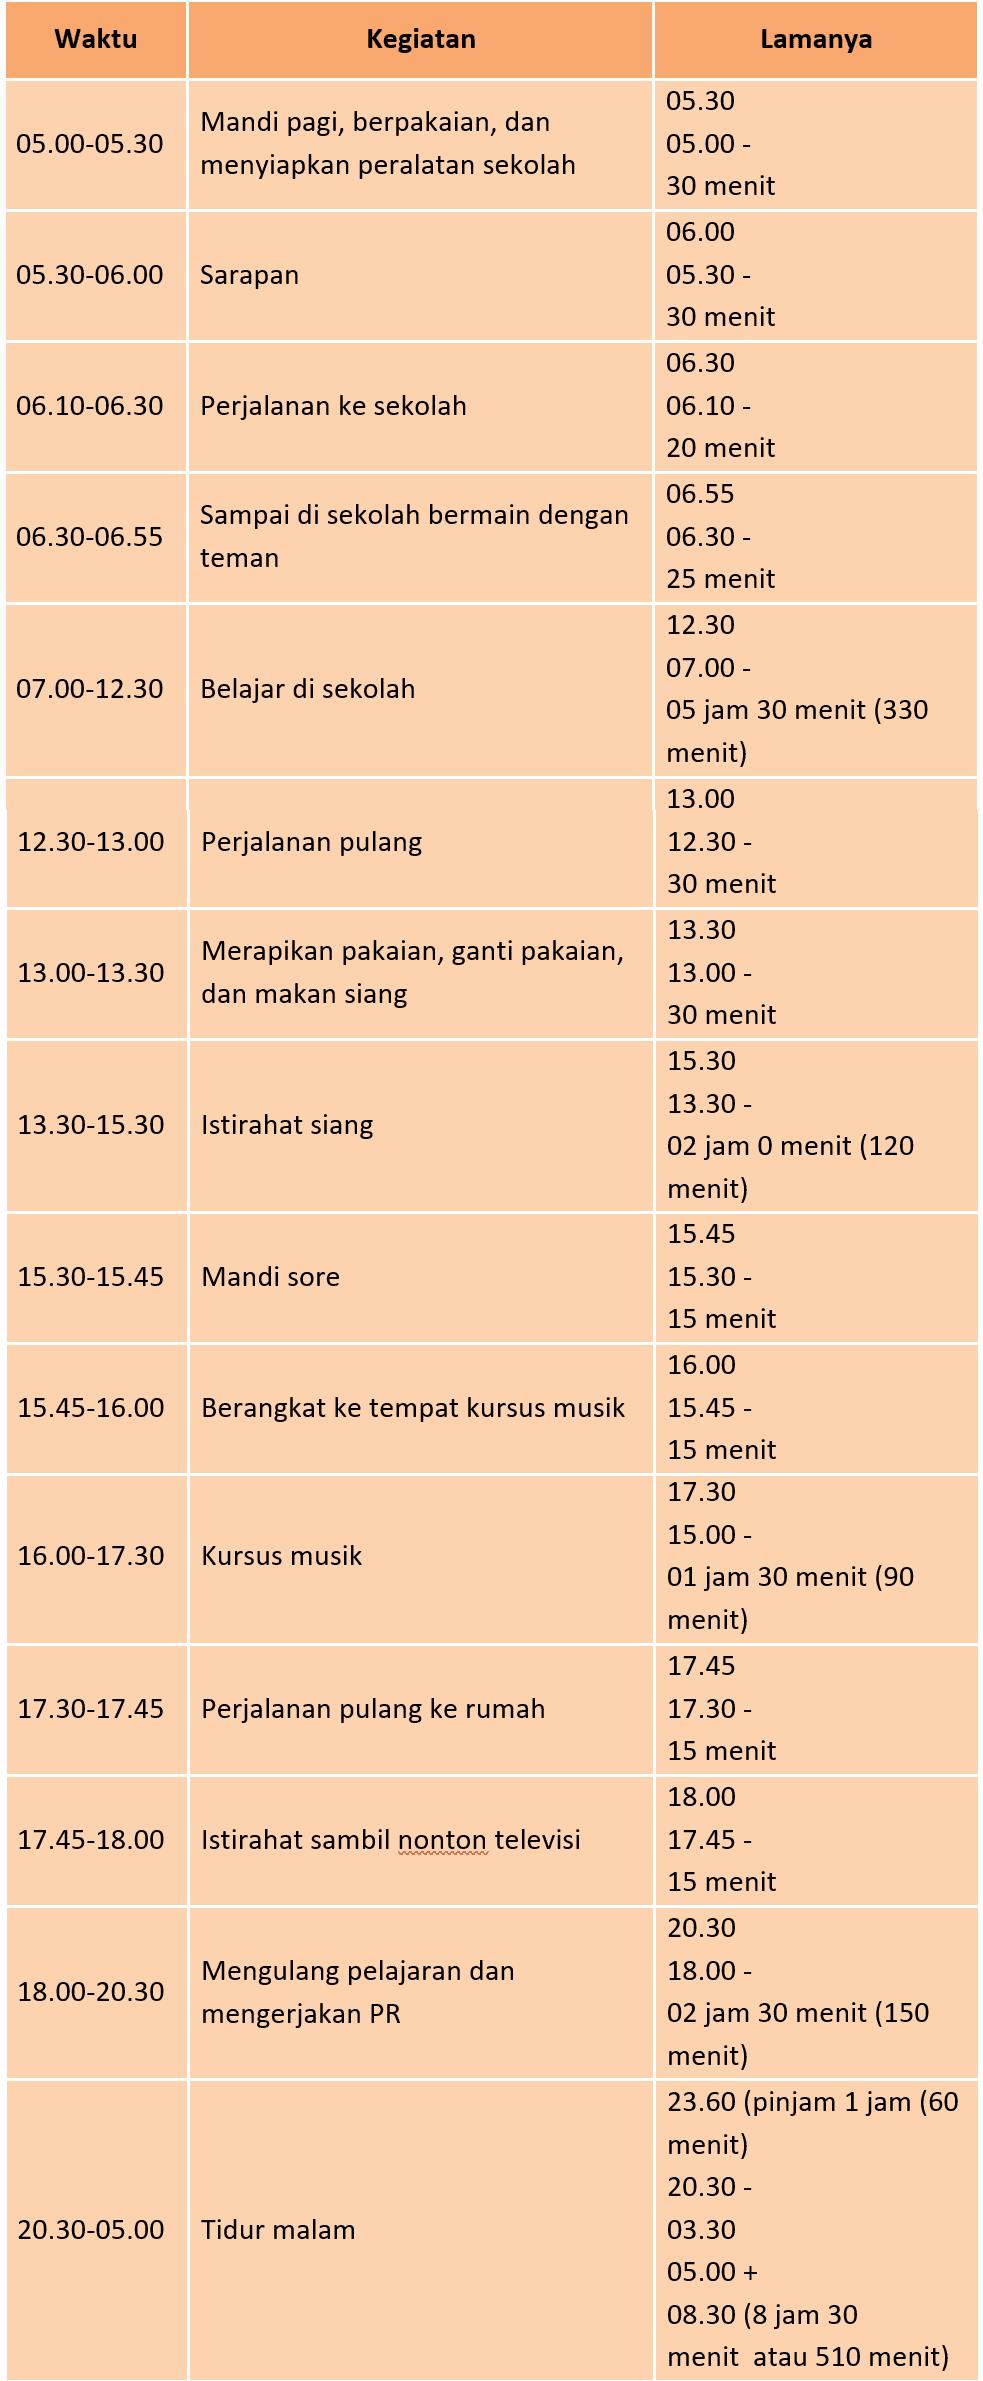 Kunci Jawaban Halaman 74, 75, 79, 80 Tema 6 Kelas 3